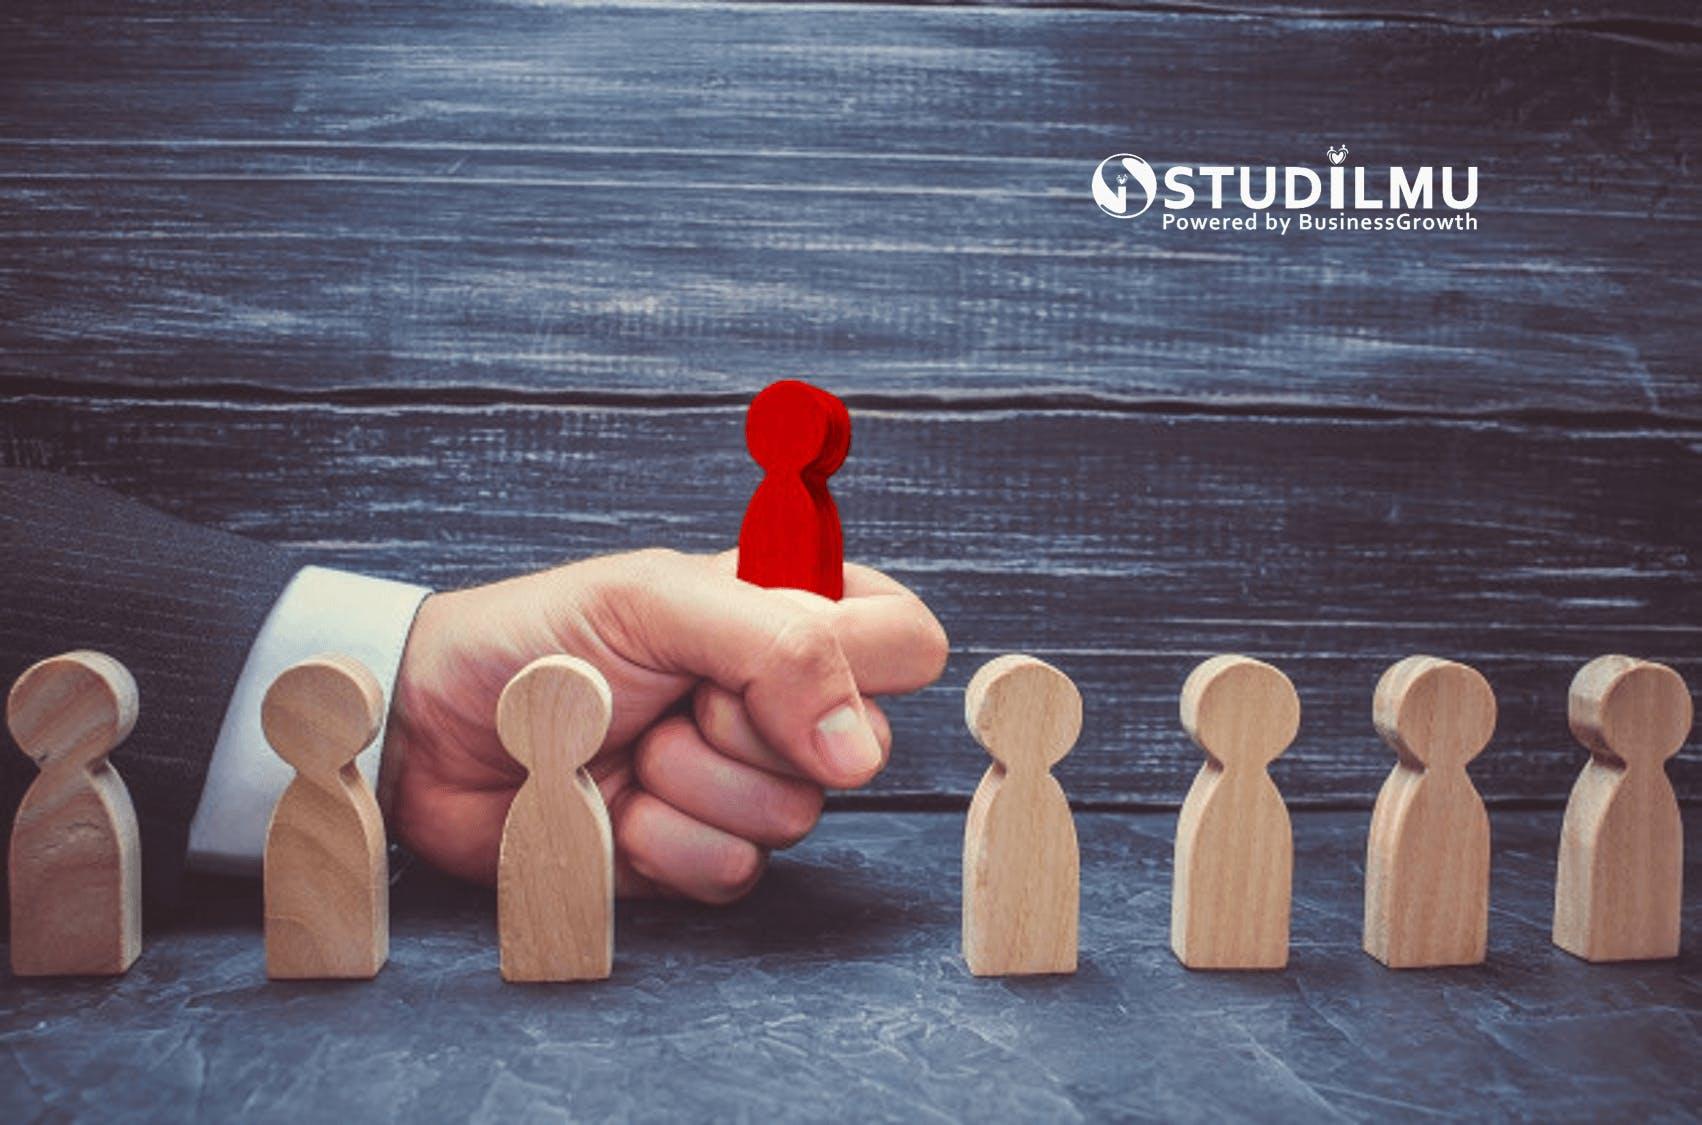 STUDILMU Career Advice - 5 Ciri-ciri Kepemimpinan yang Baik dan Menginspirasi